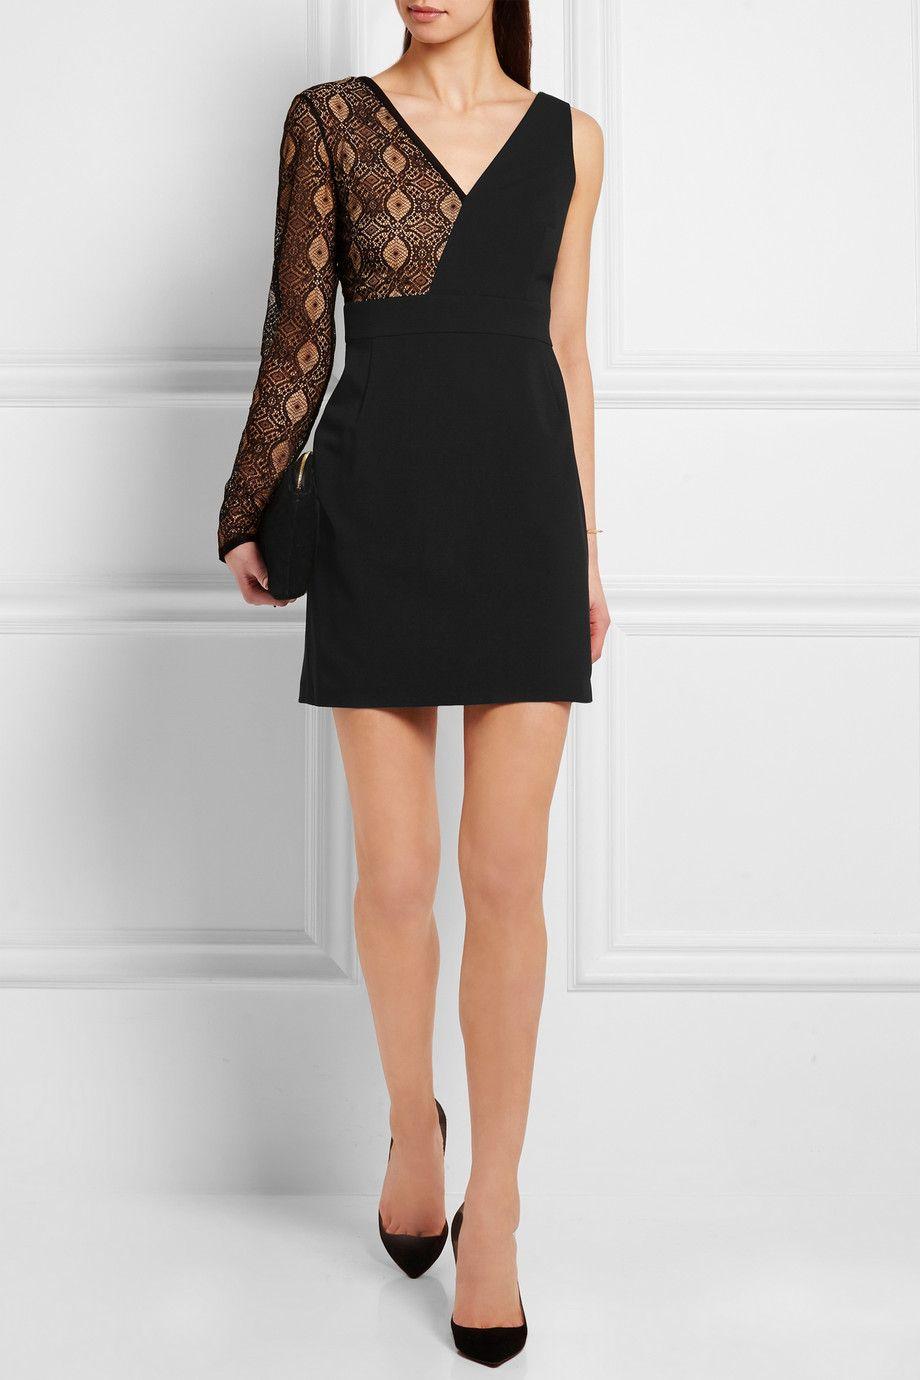 Versus | Lace-paneled stretch-cady mini dress | NET-A-PORTER.COM